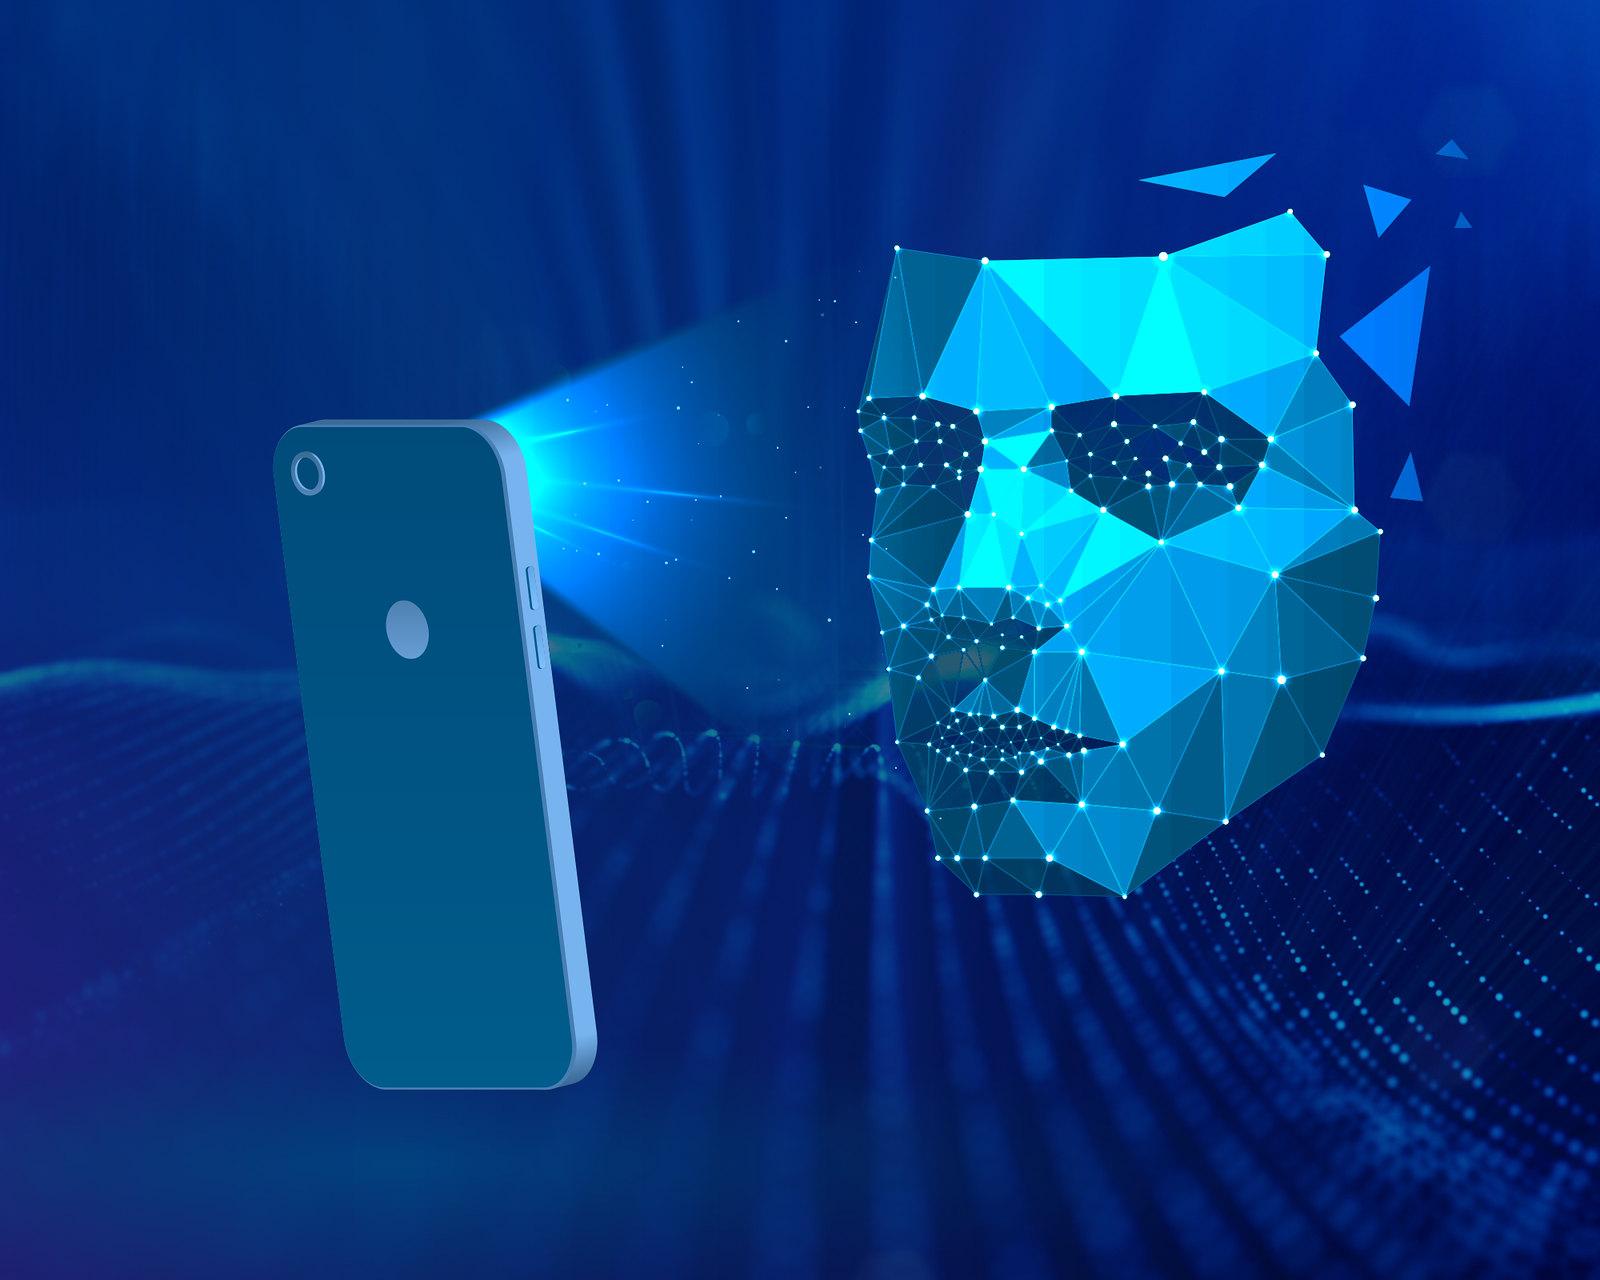 Технология распознавания лиц несовершенна ипри использовании может нанести вред ни очём неподозревающим людям.